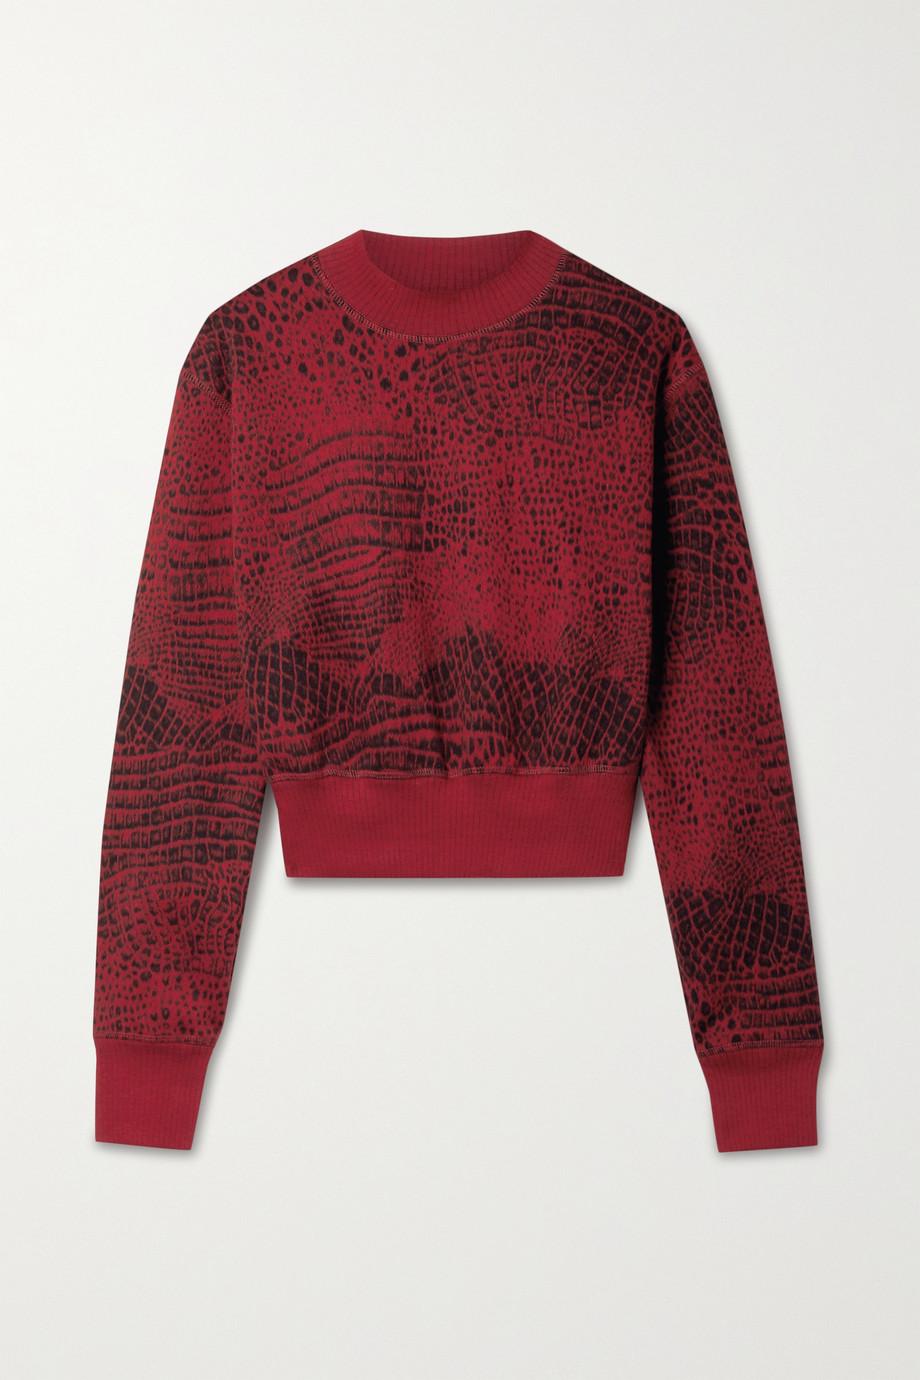 TWENTY Montréal Caiman Hyper Reality cropped jacquard-knit cotton-blend sweater